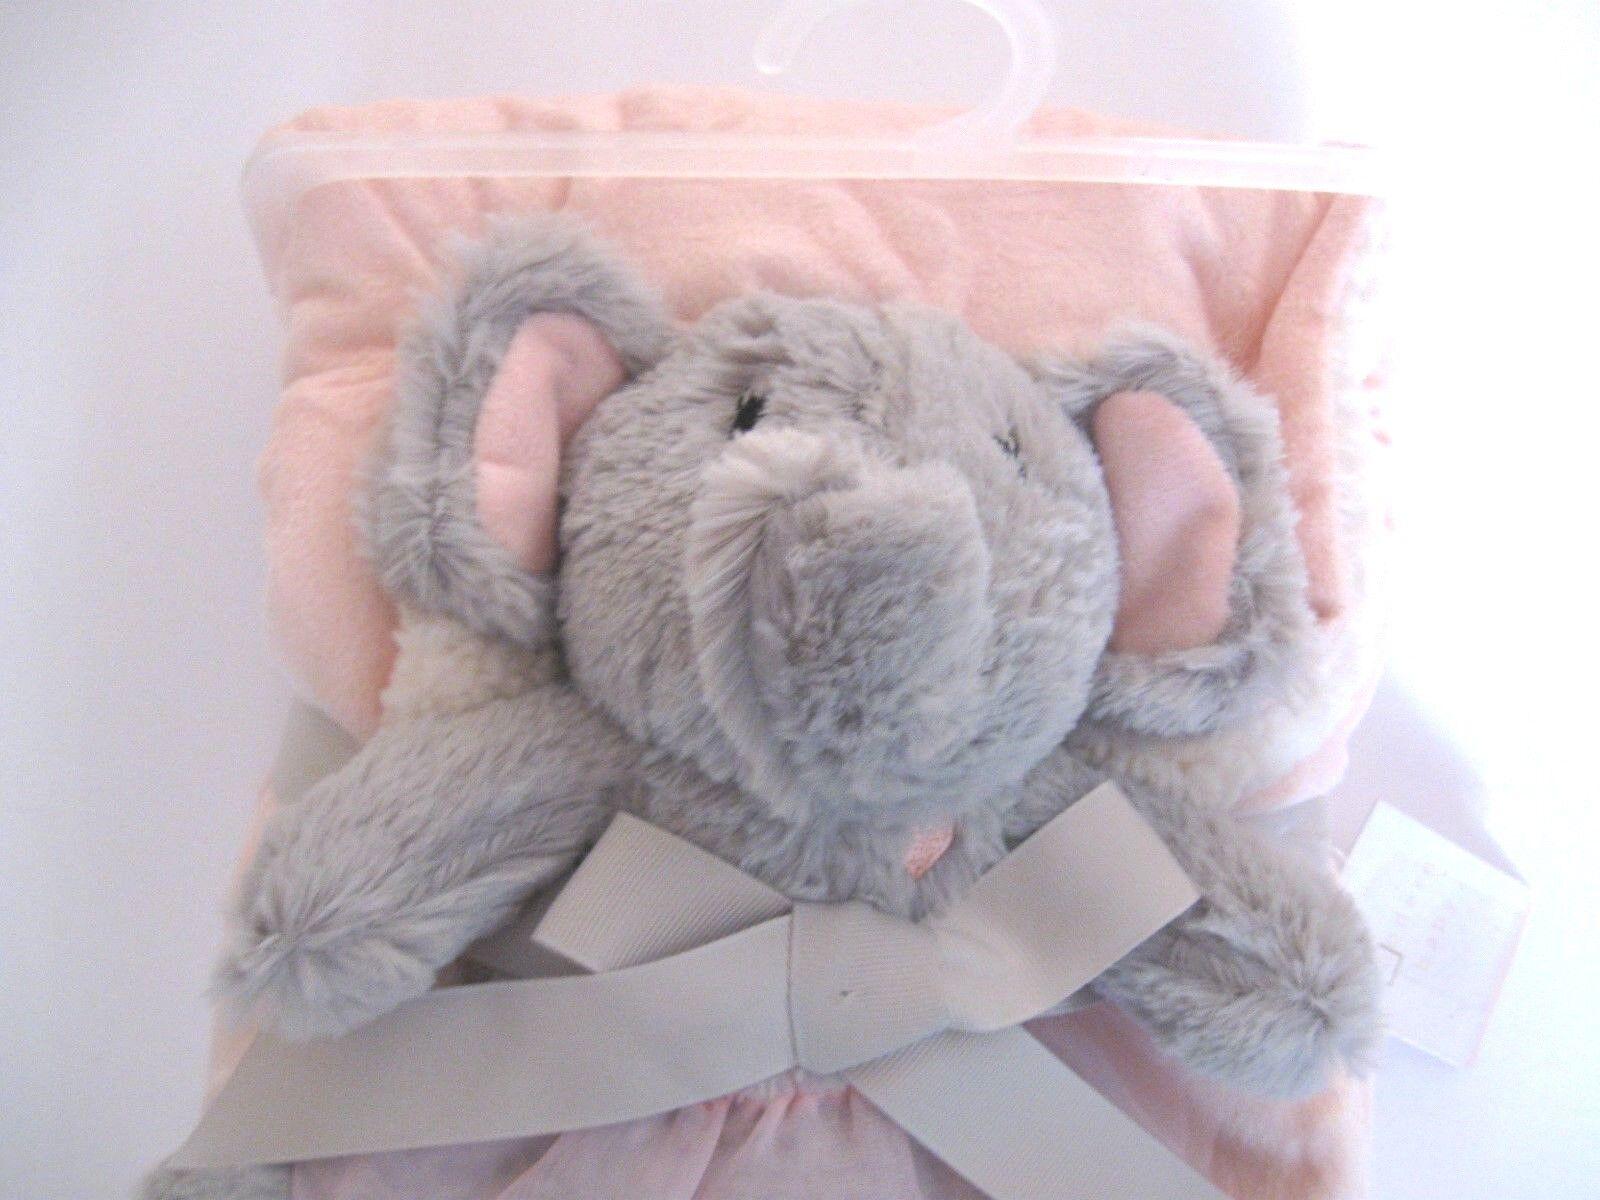 Modern Baby New Plush Blanket Set Elephant Toy Sherpa Revers